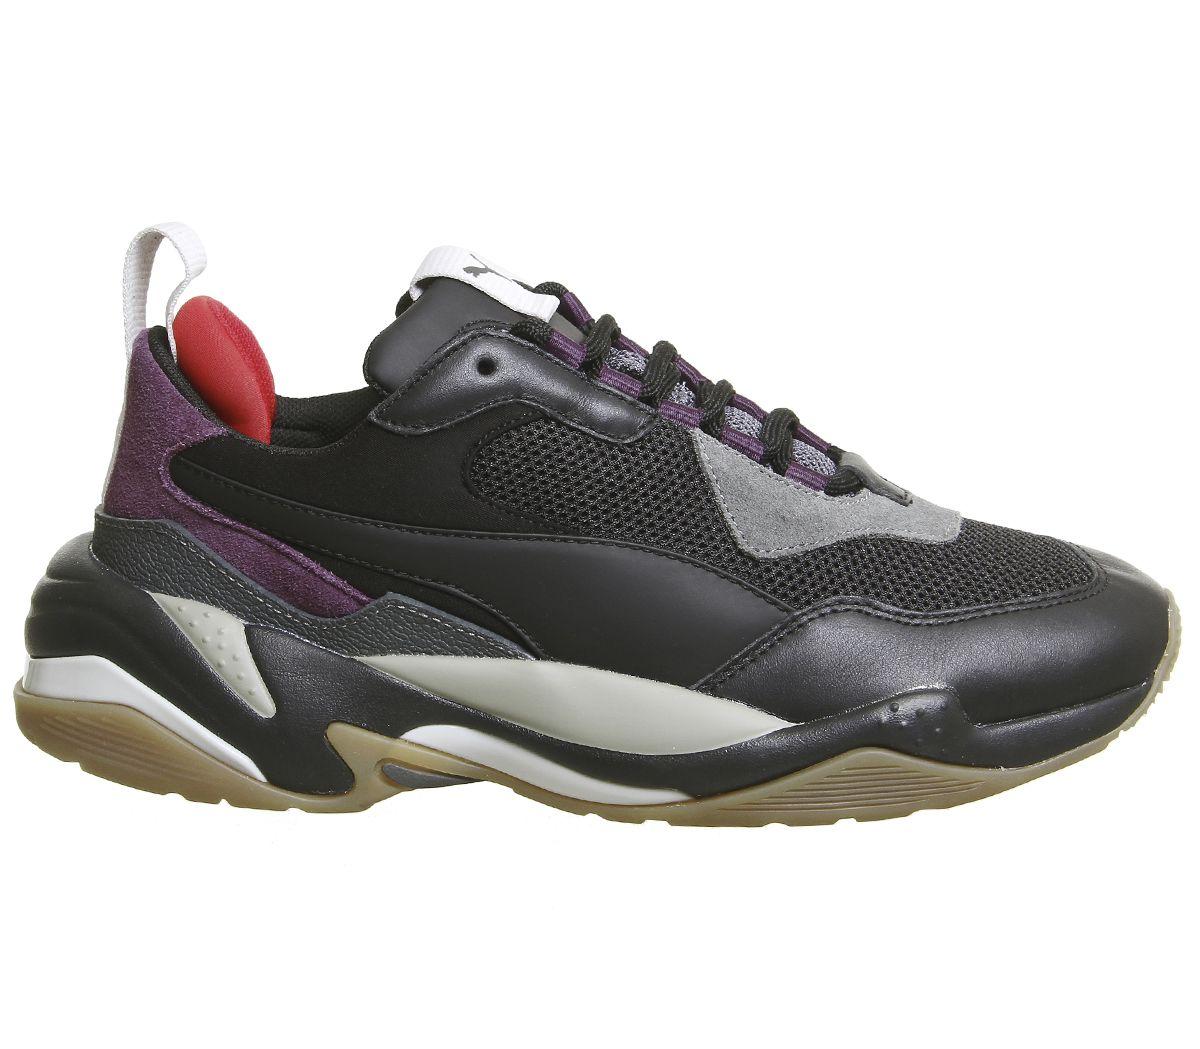 Mens-Puma-Thunder-Spectra-Trainers-Black-Grey-Purple-Gum-Trainers-Shoes thumbnail 4